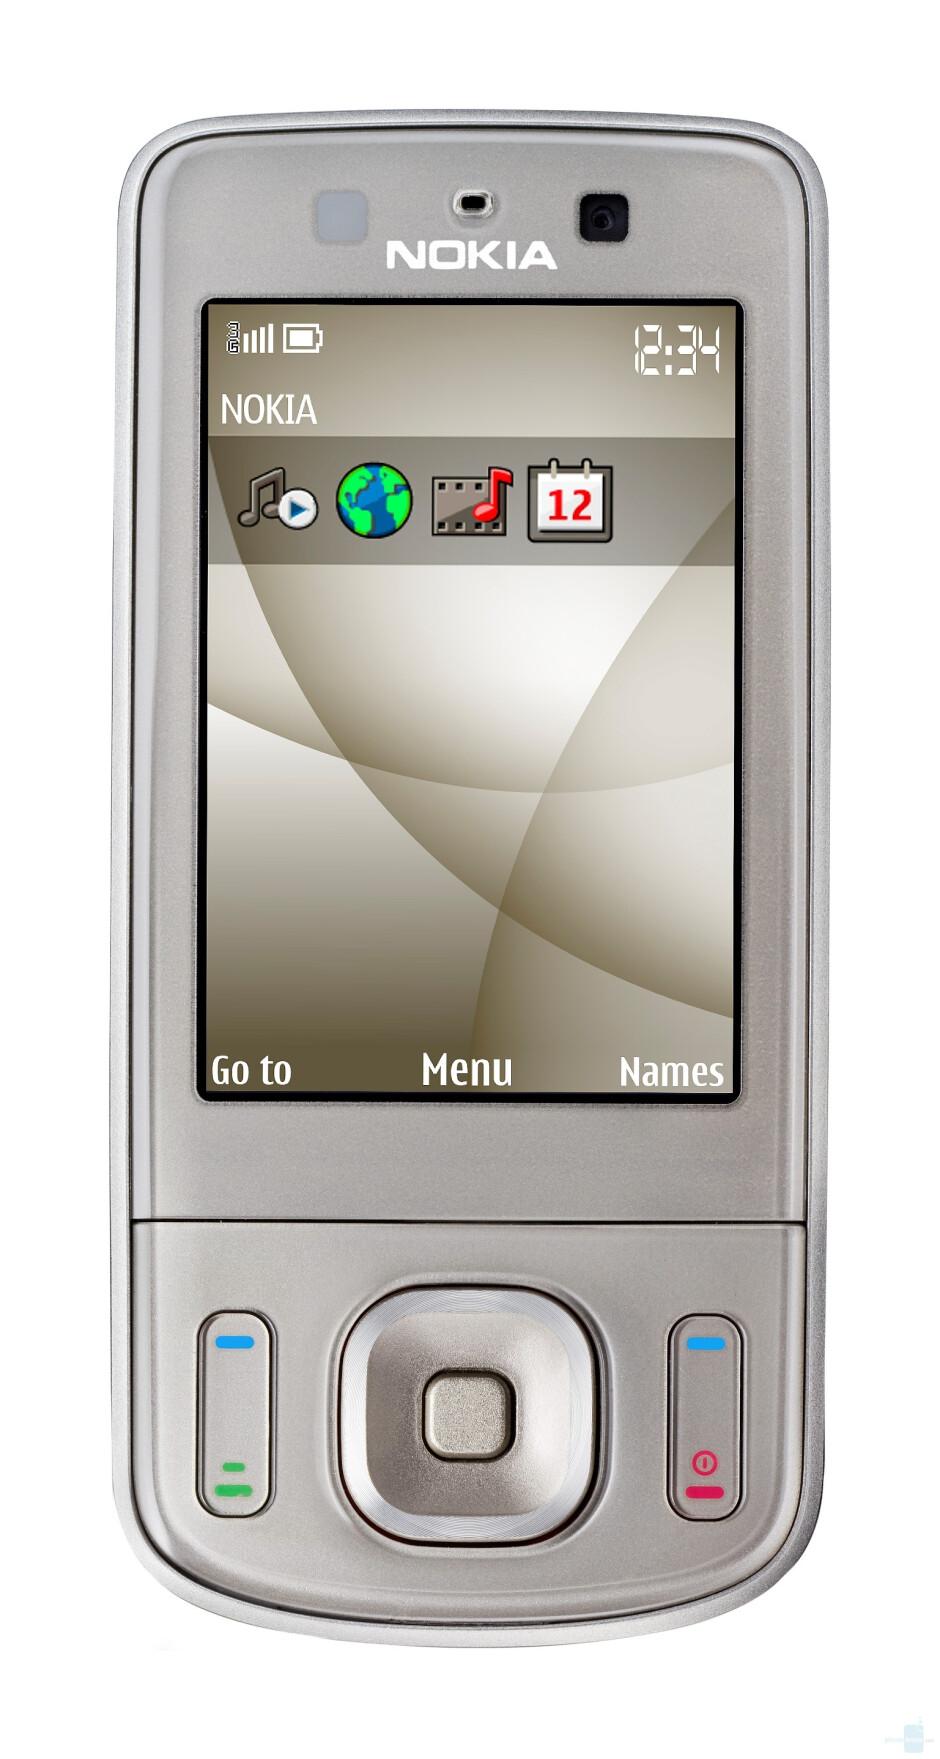 Nokia announces the 6260 slide